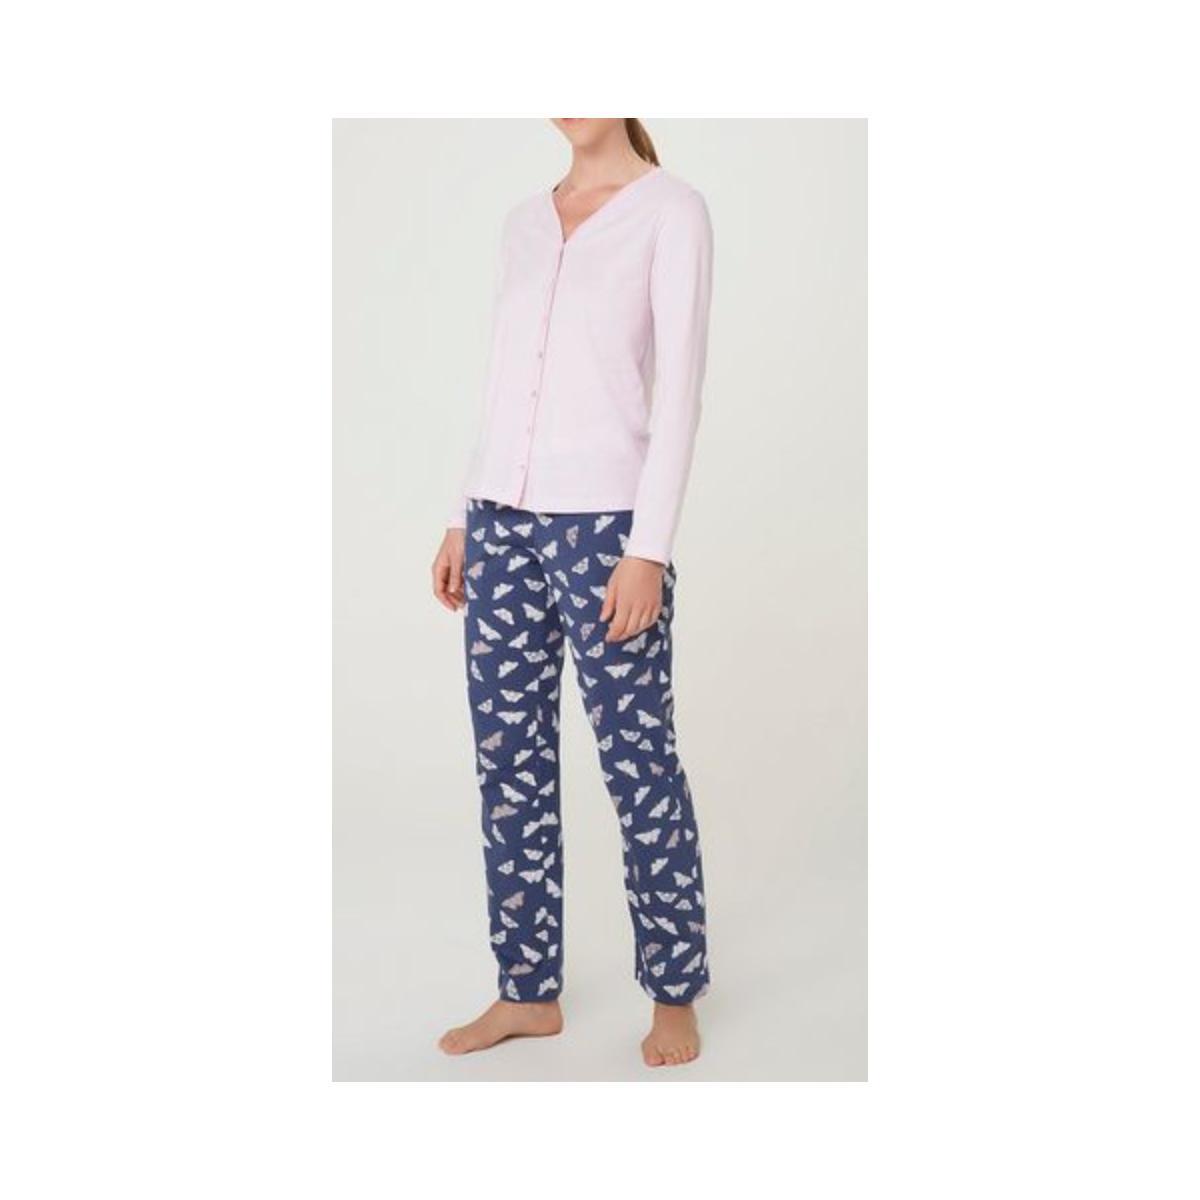 Pijama Feminina Hering 7cb7 Xlien Marinho/rosa